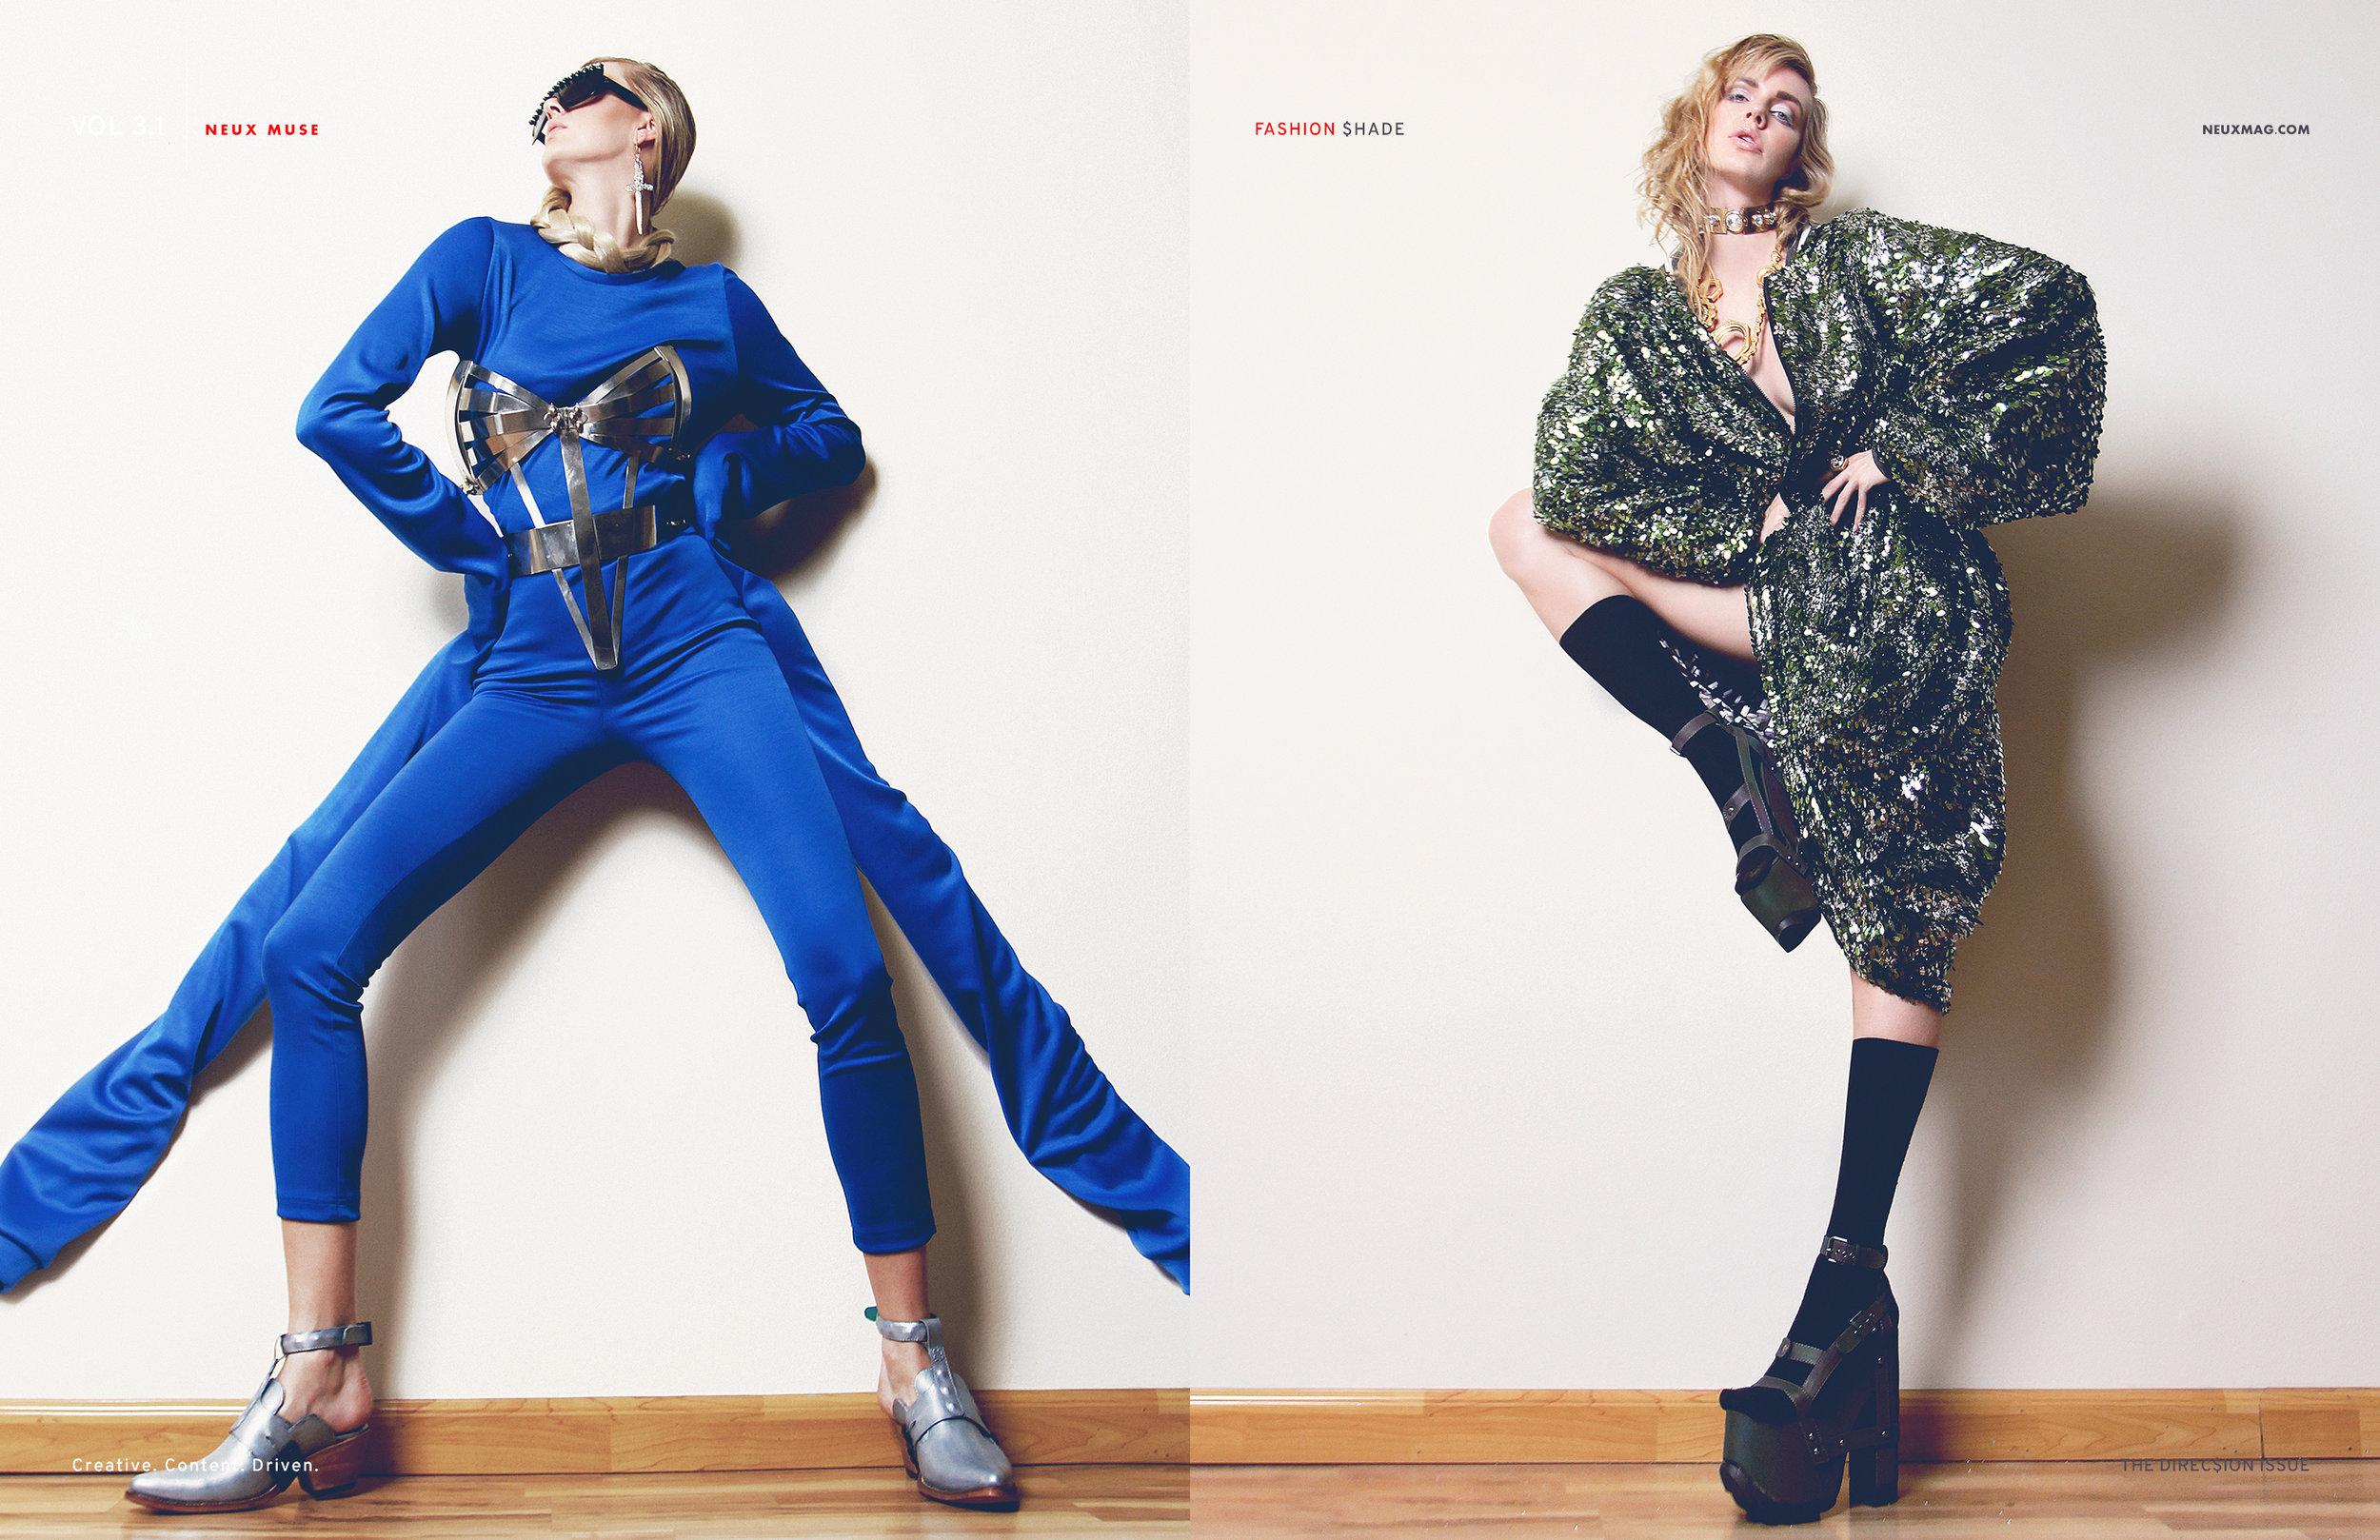 Fashion_Neux_Shade_layout_112017_hr_layout_10.jpg